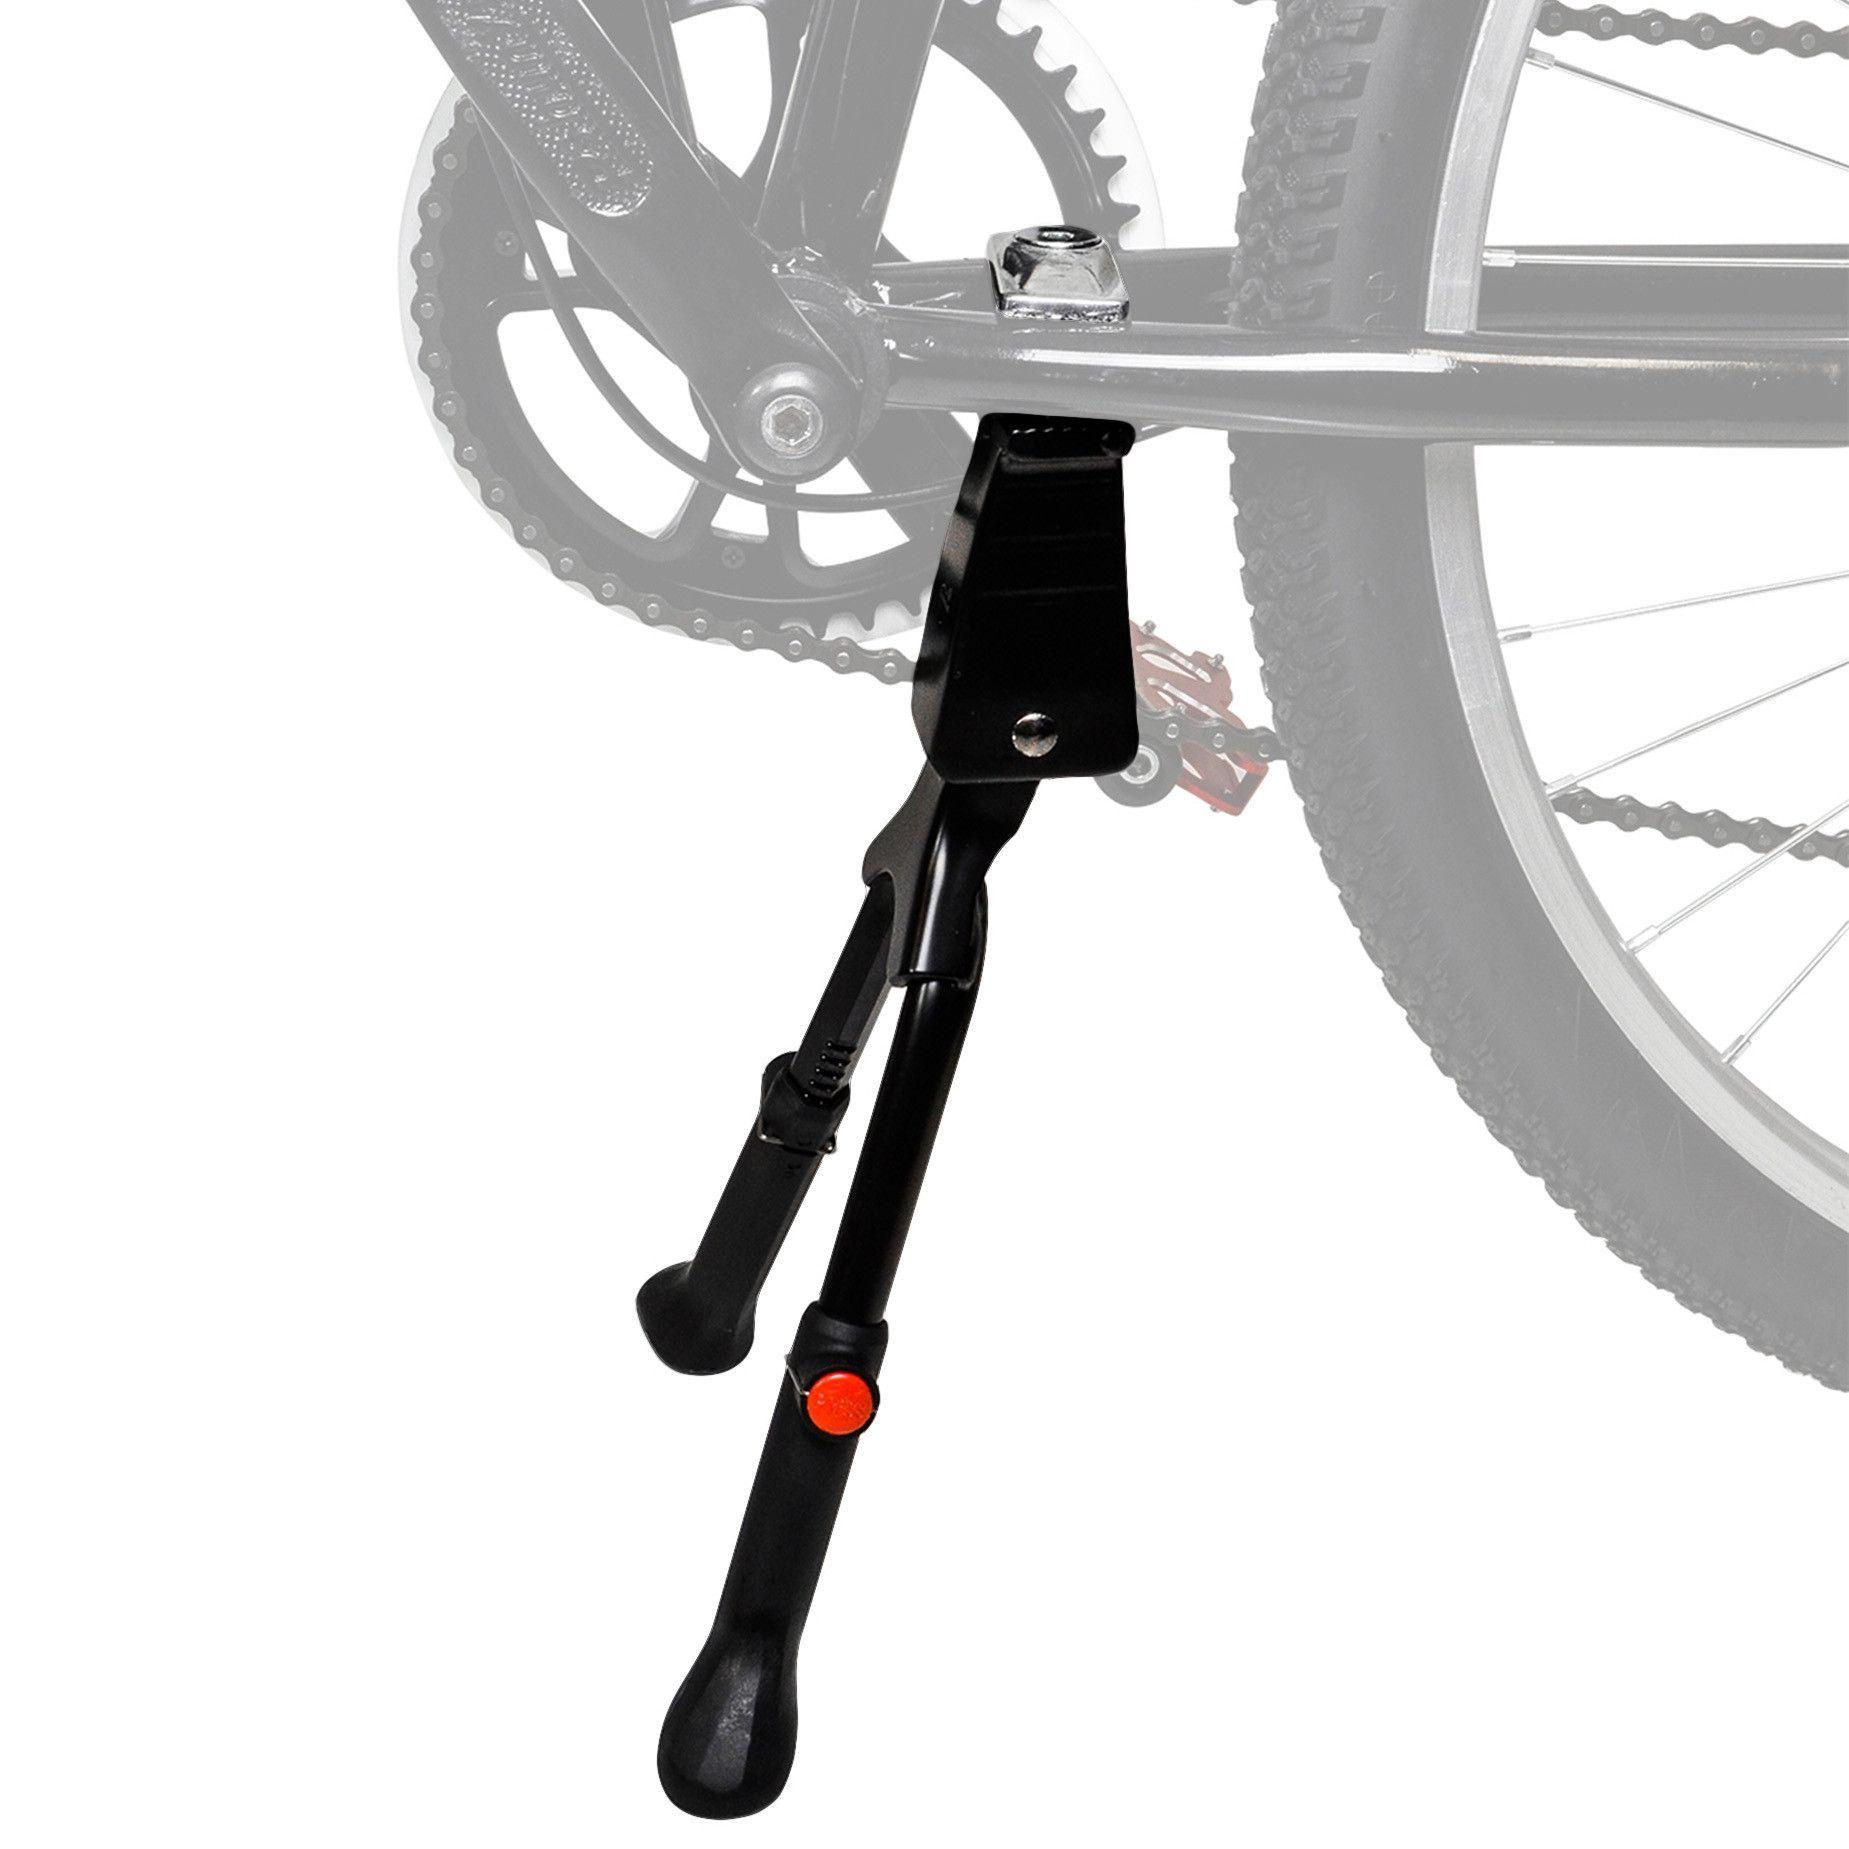 Portable Bike Kick Stand Aluminum  Cycling Bicycle Brace Parking Leg Rod Parts